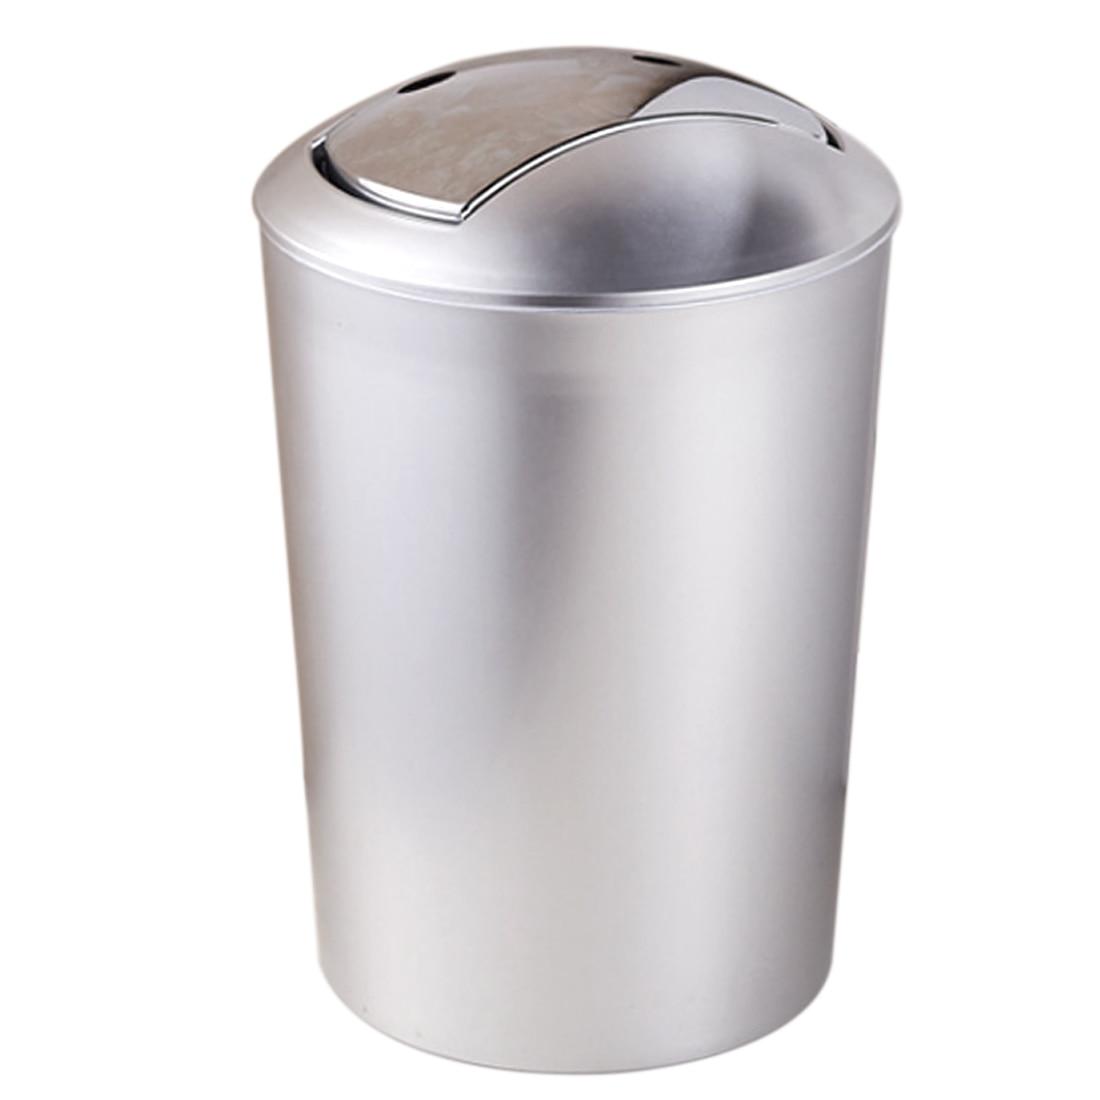 US $11.36 20% OFF 6.5L Bathroom Garbage European Style Trash Wastebin With  Lid Kitchen Trash Cans Storage Tools Garbage Waste Bin-in Waste Bins from  ...